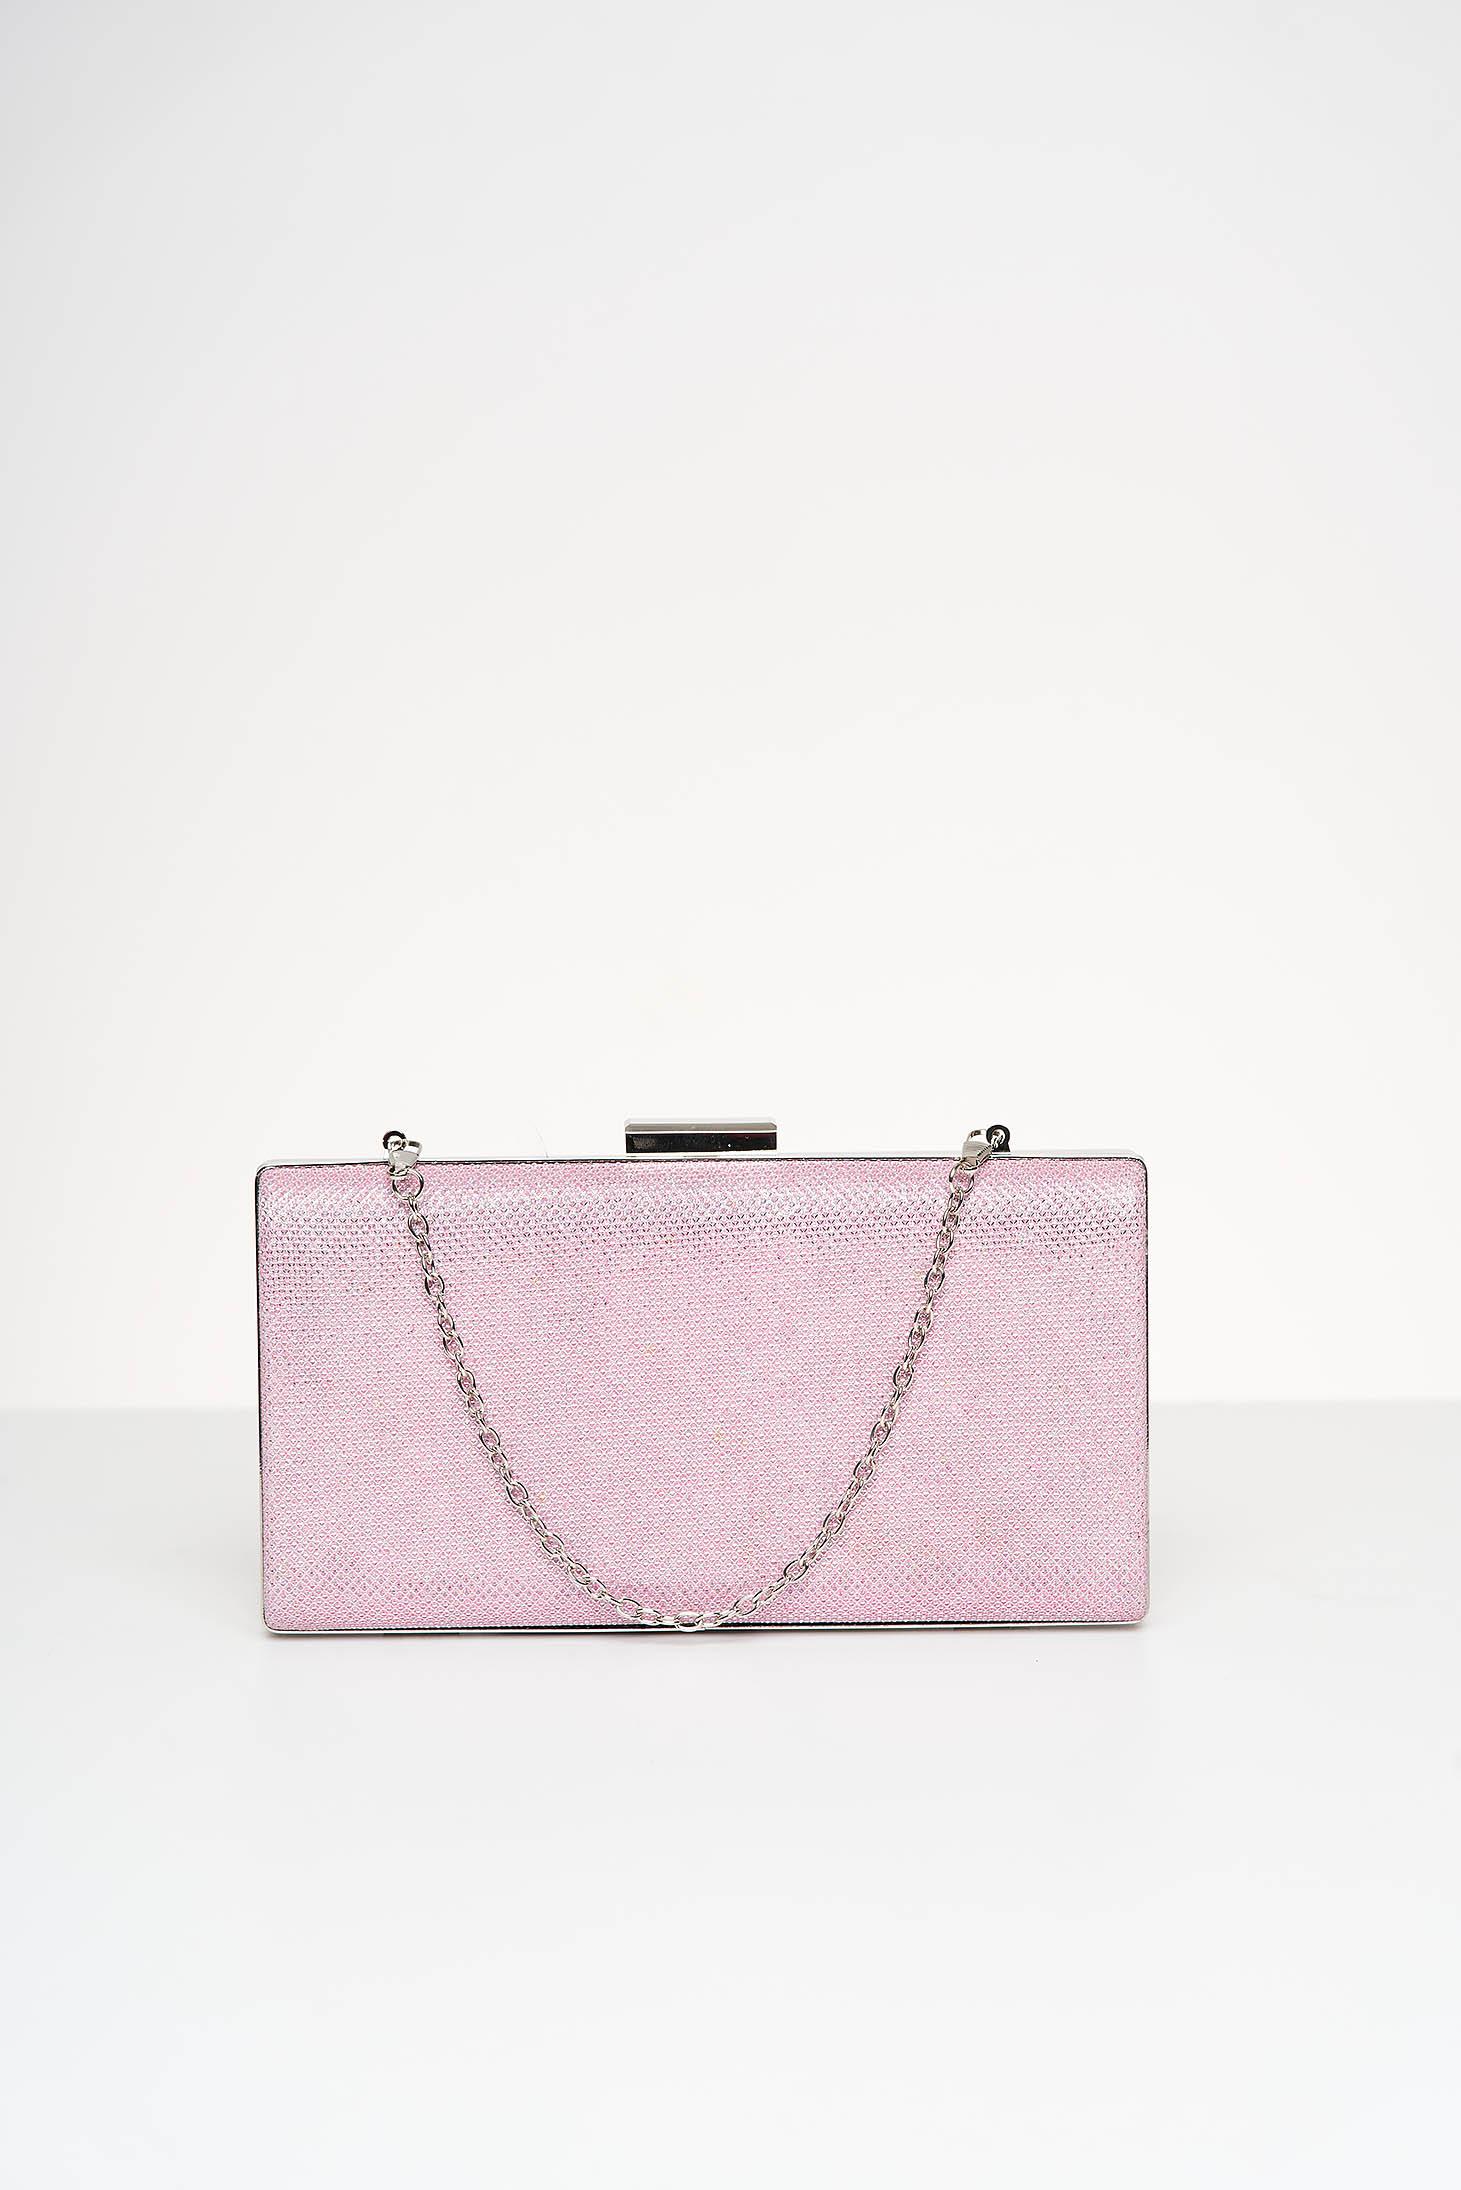 Geanta dama tip clutch roz deschis de ocazie cu aplicatii cu sclipici